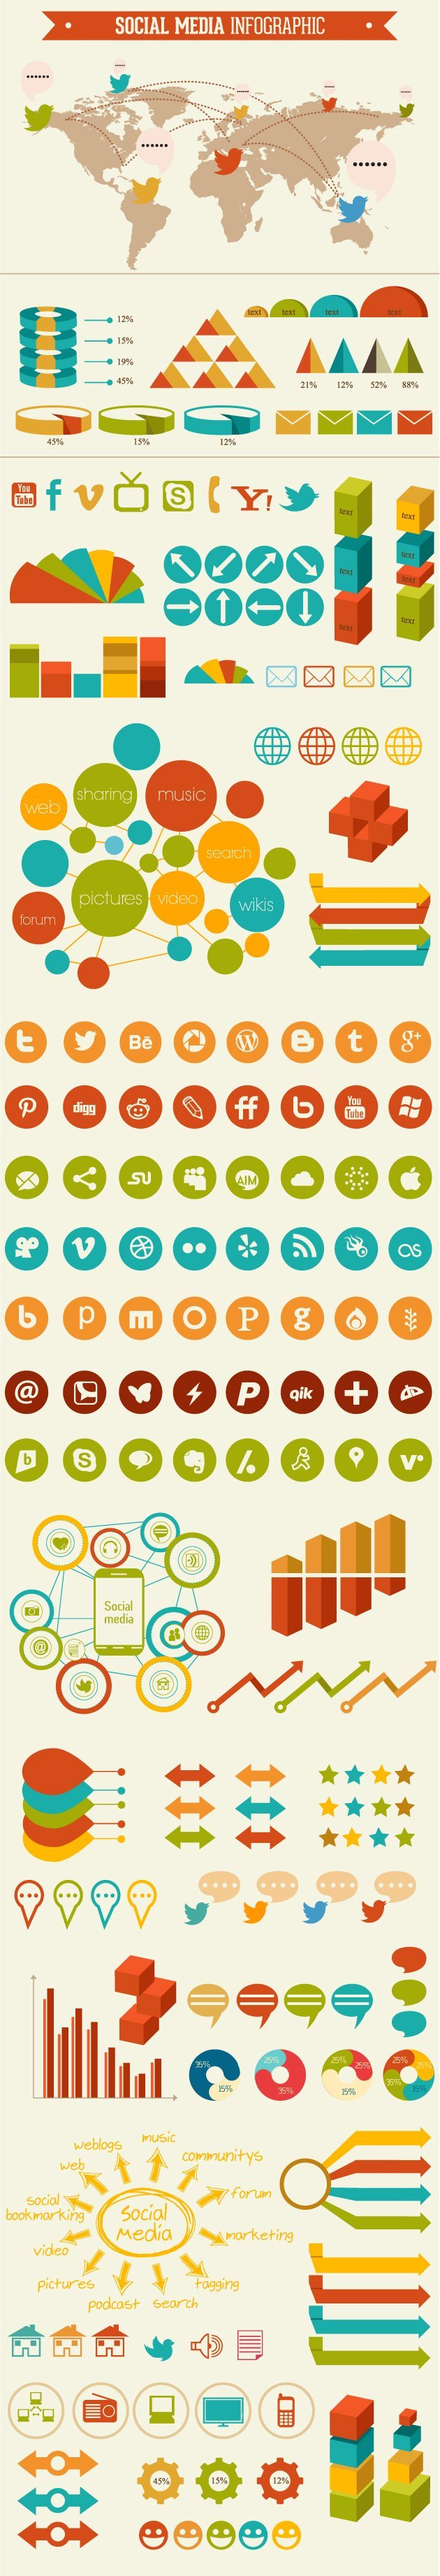 social-media-infographic-vector